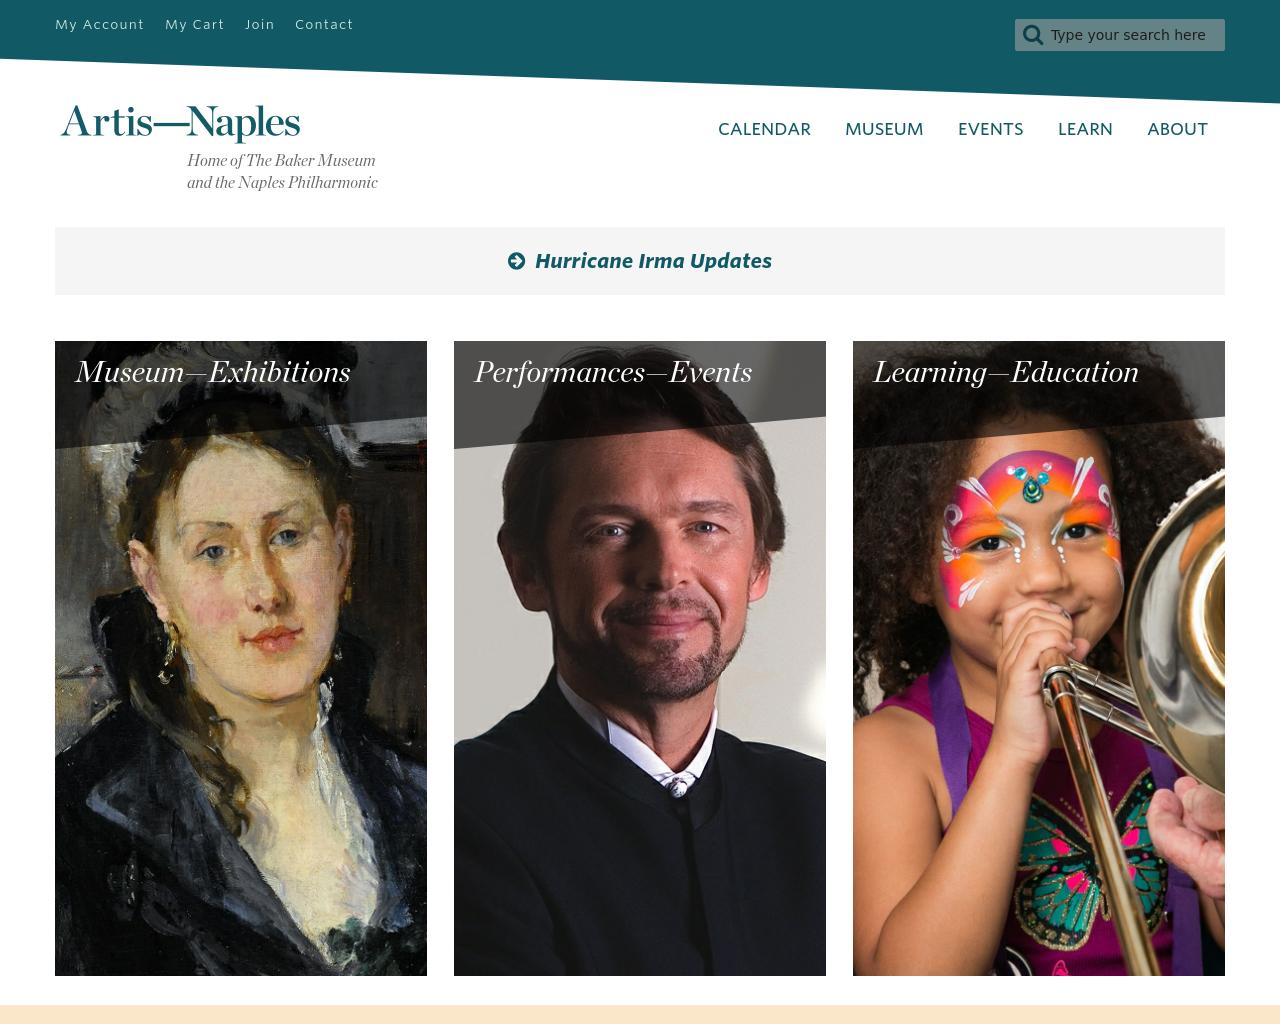 Artis----Naples-Advertising-Reviews-Pricing